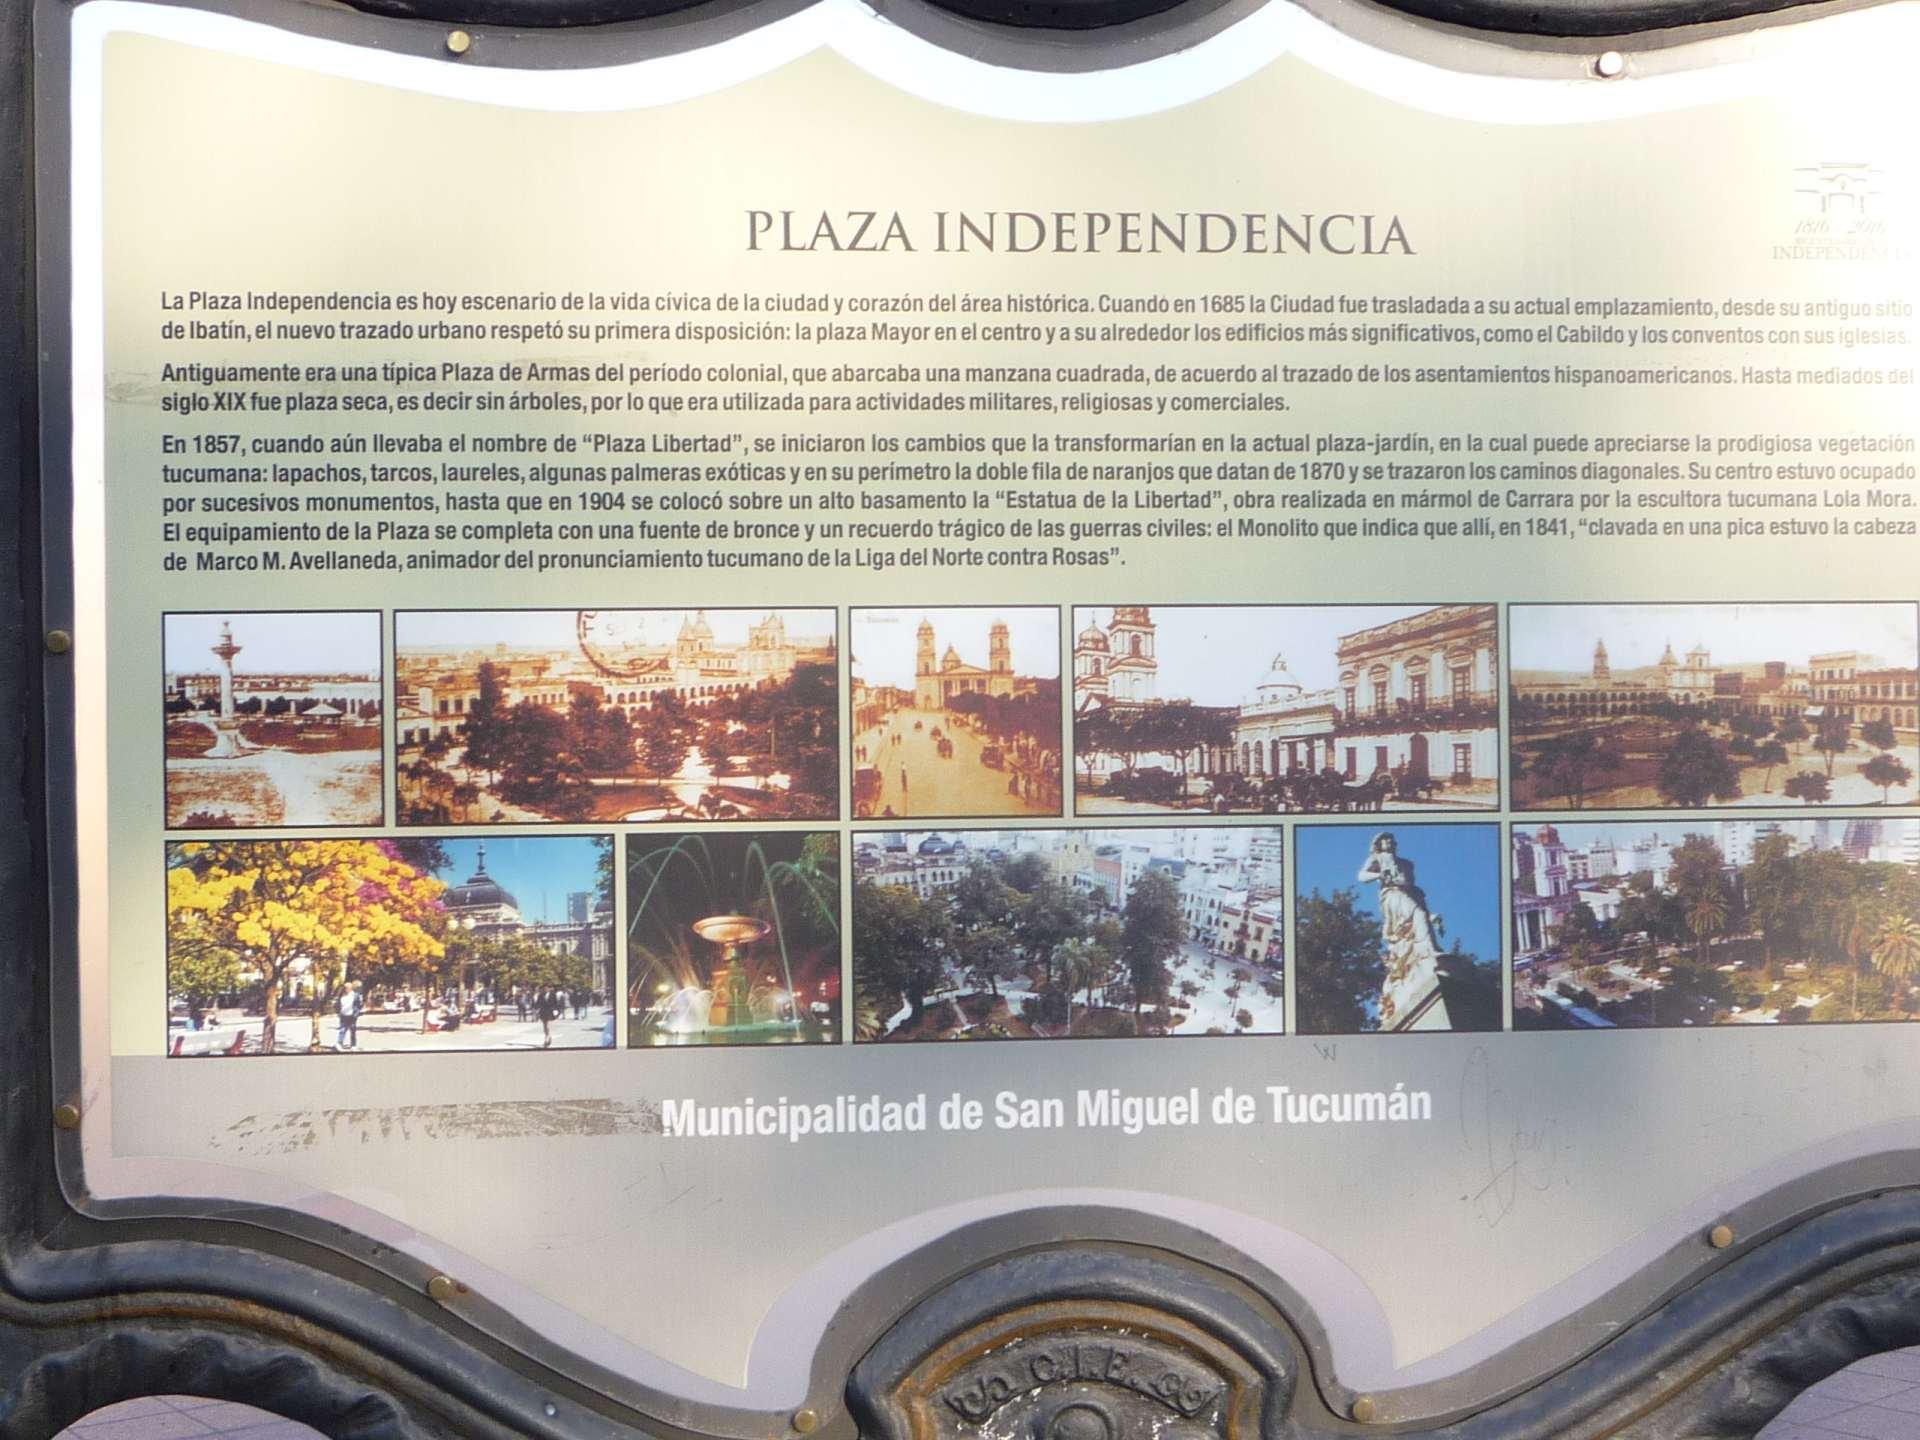 Plaza-independencia-Tucuman